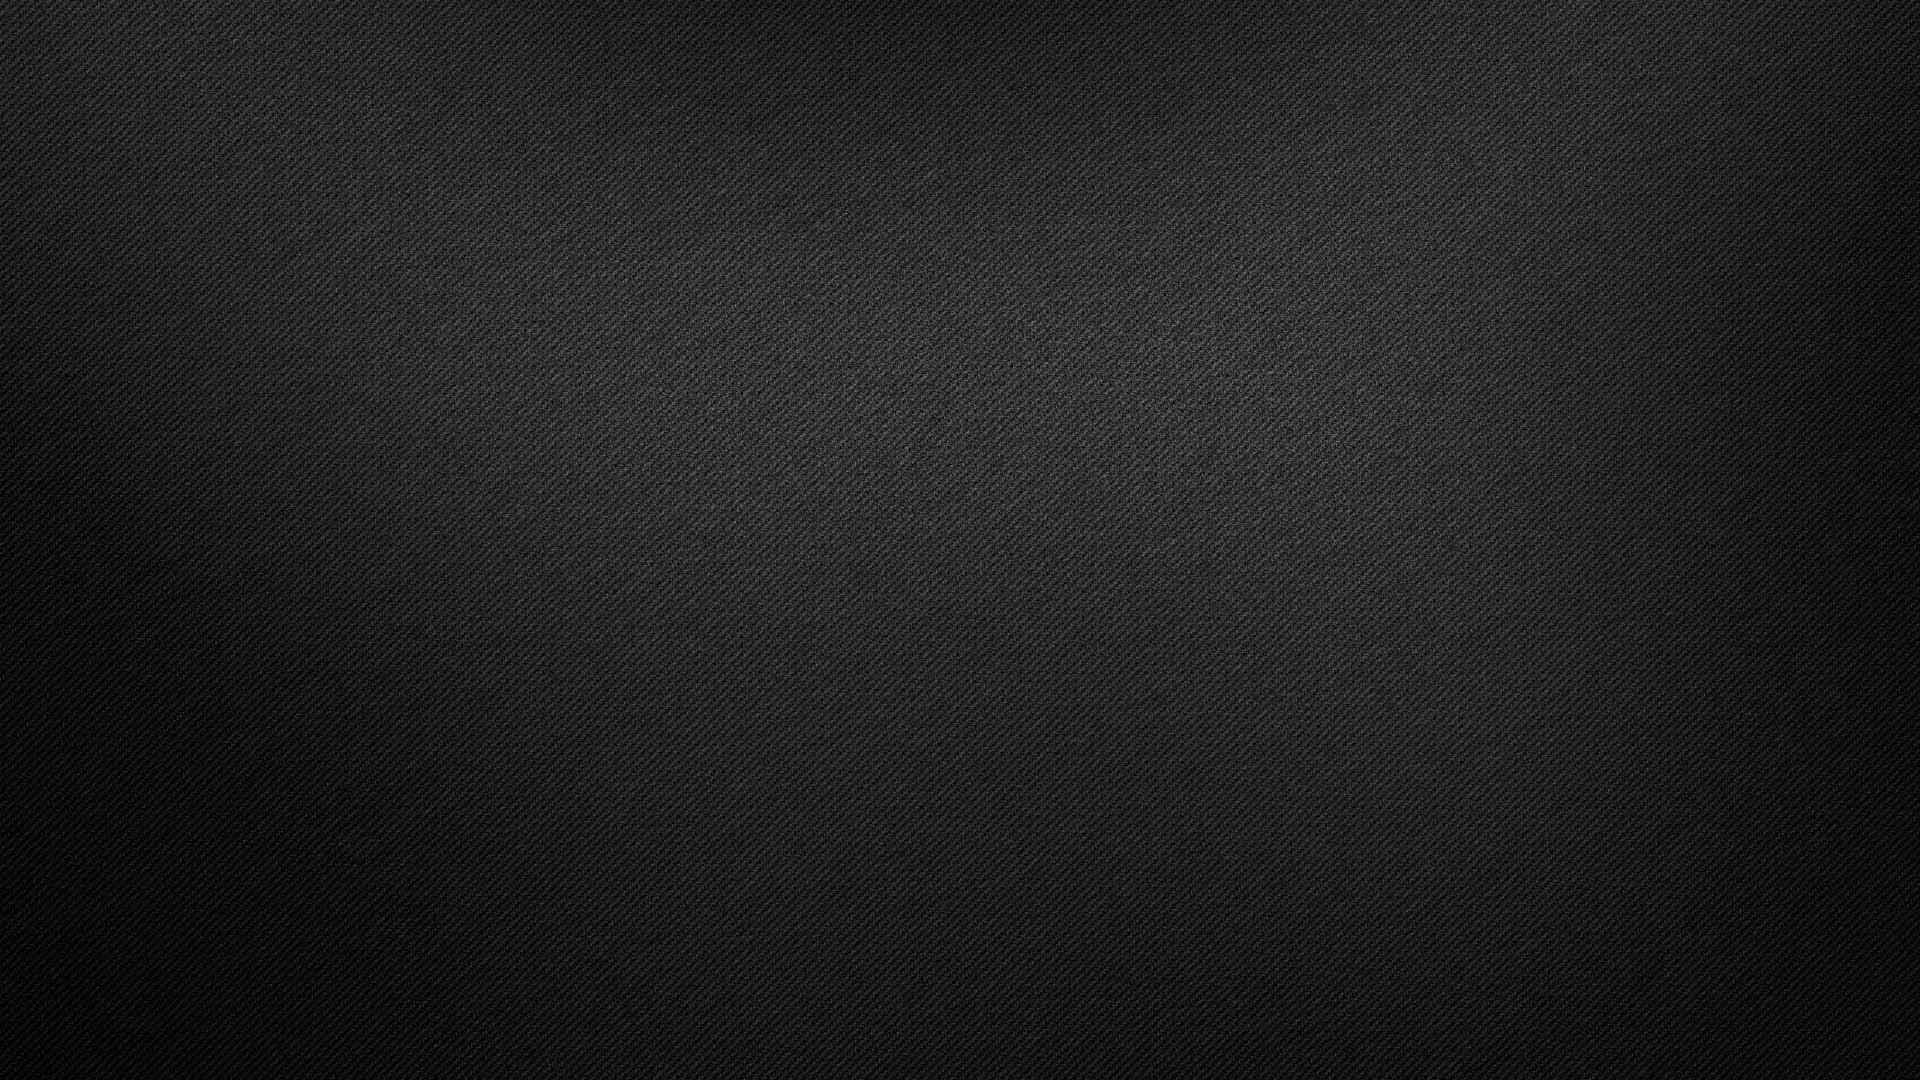 1920x1080 Black Denim Background desktop PC and Mac wallpaper 1920x1080